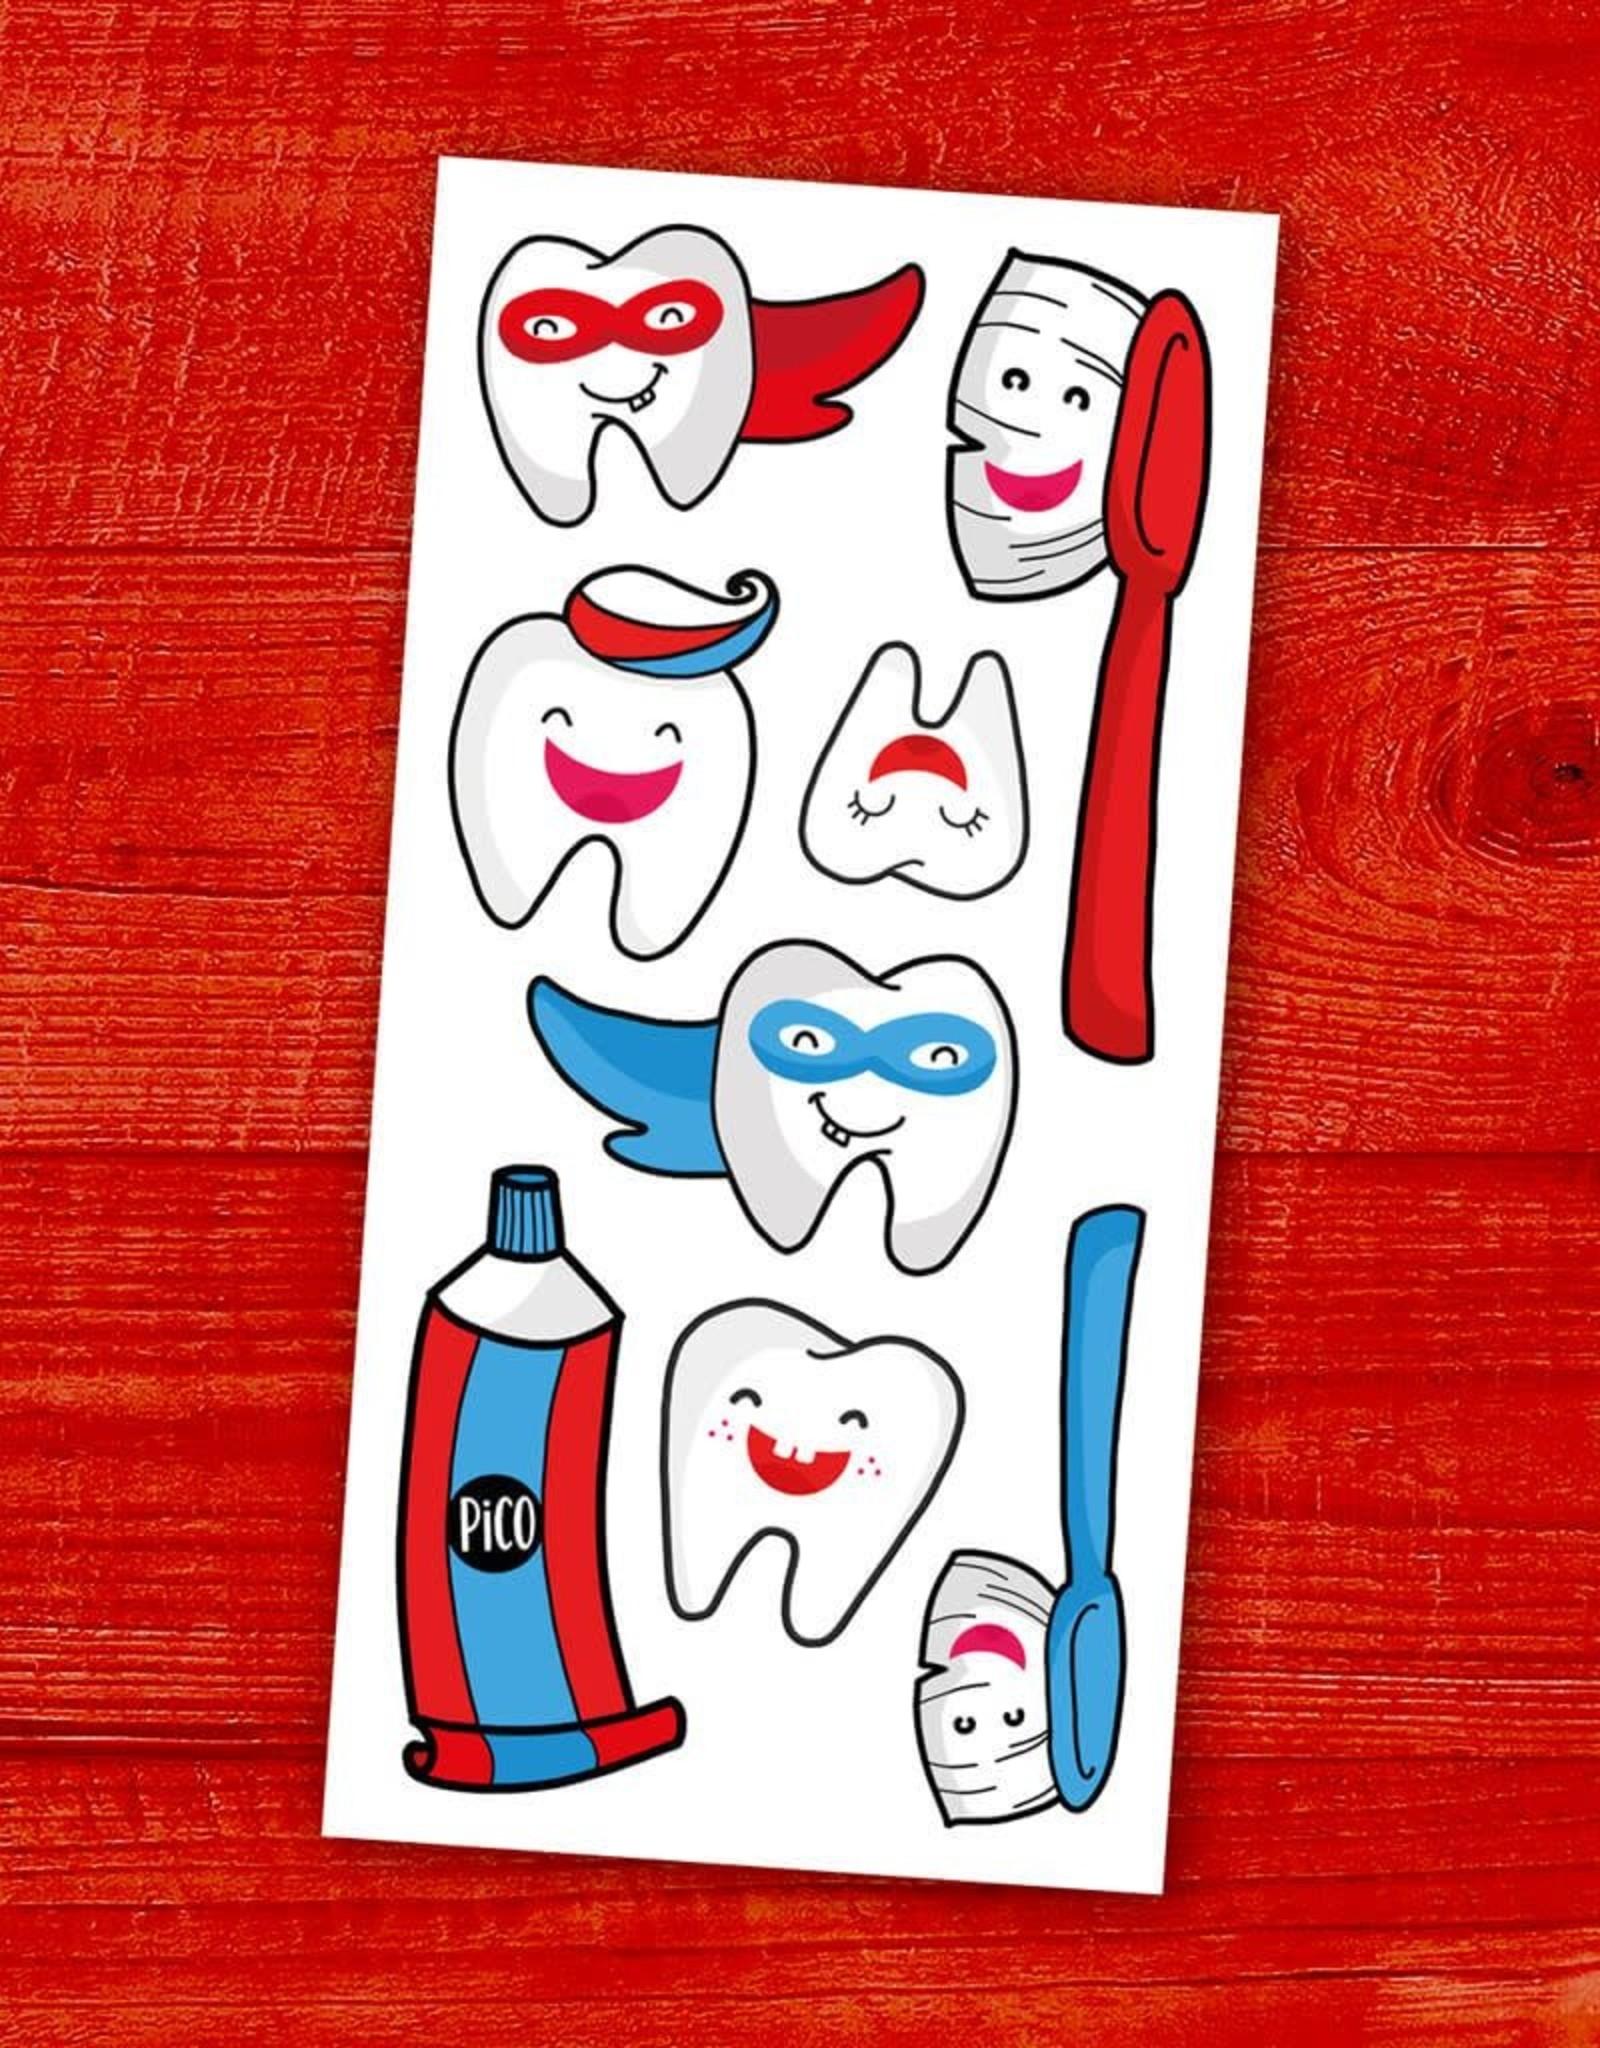 Pico Tatouage Pico Tatoo Brosse tes dents